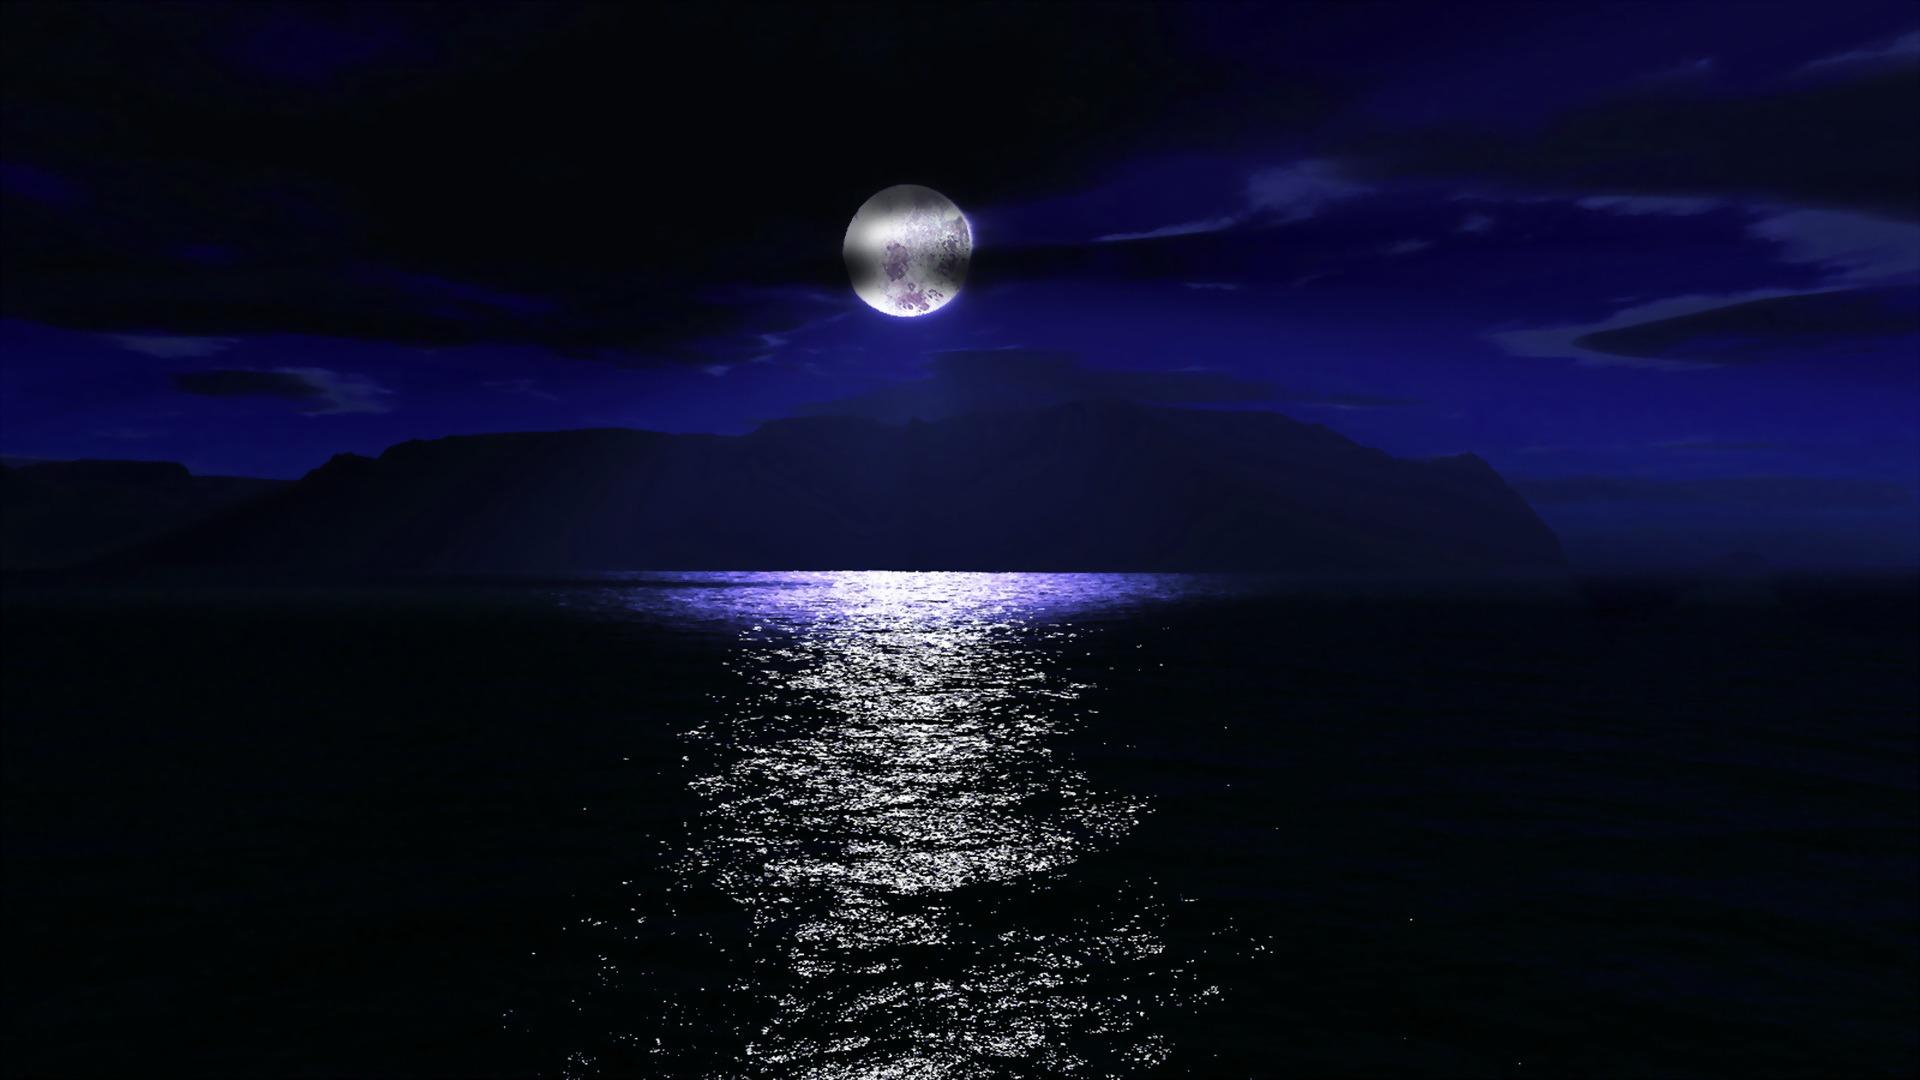 Dark Night Moon Hd Desktop Wallpaper ideal for a HP desktop PC 1920x1080